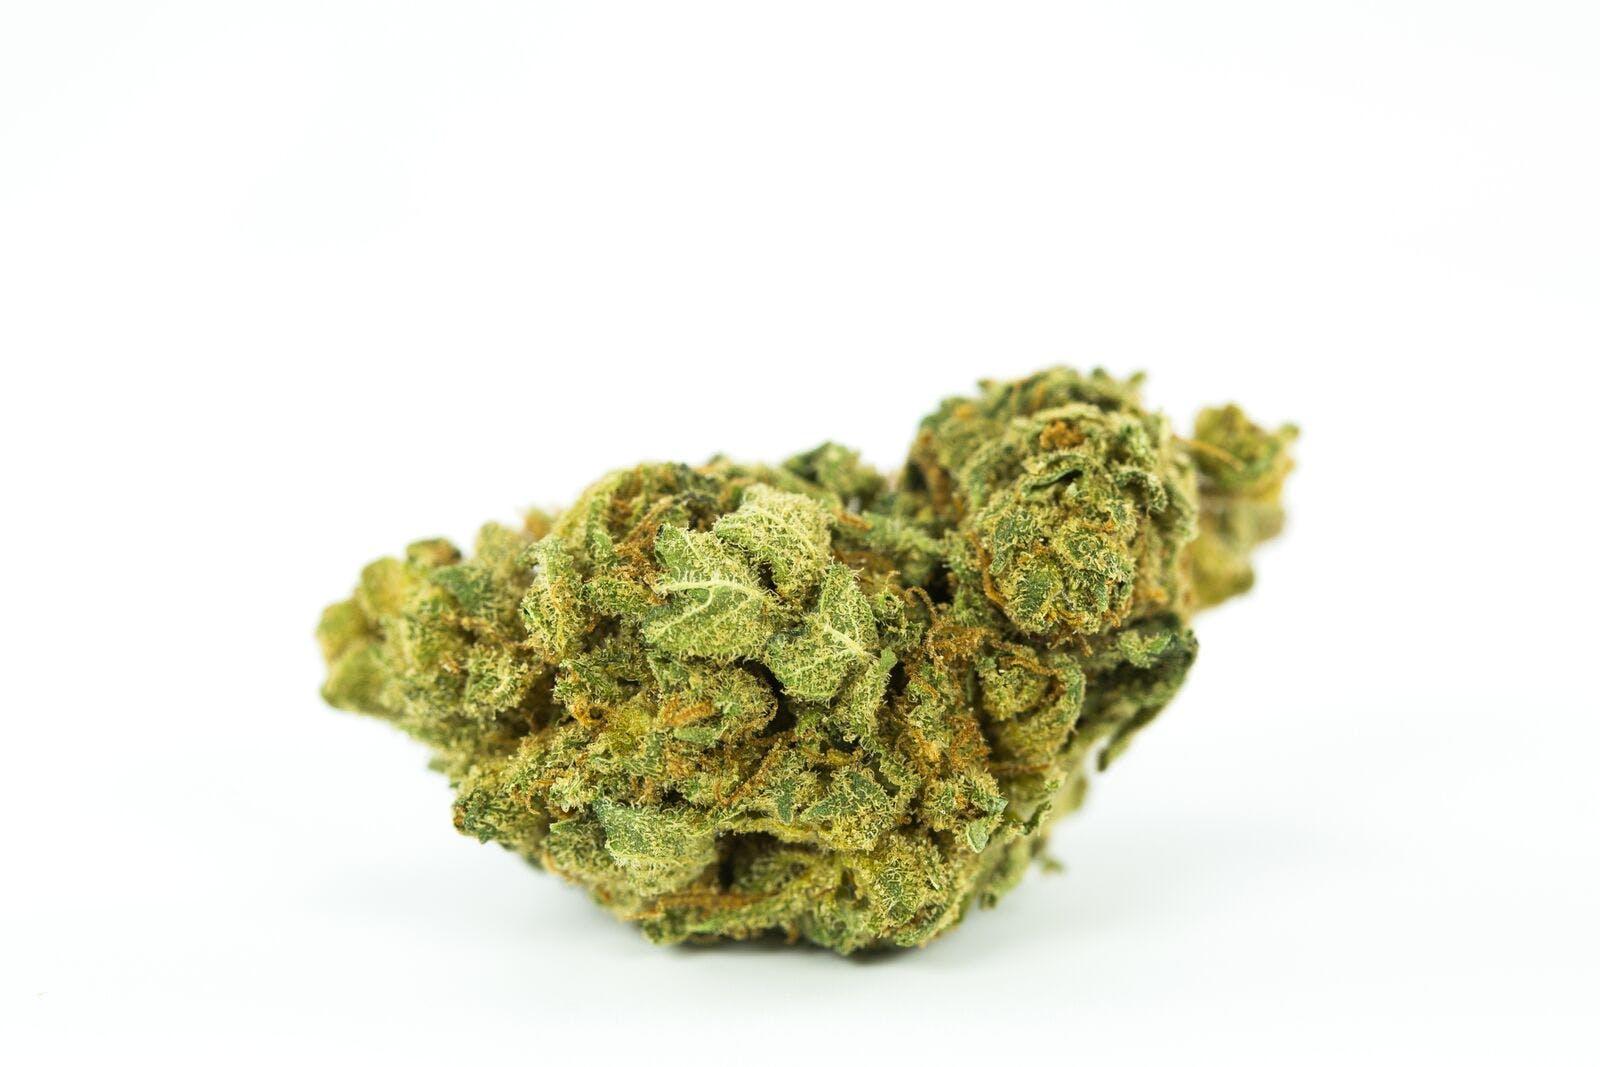 Cannalope Kush Weed; Cannalope Cannabis Strain; Cannalope Hybrid Marijuana Strain